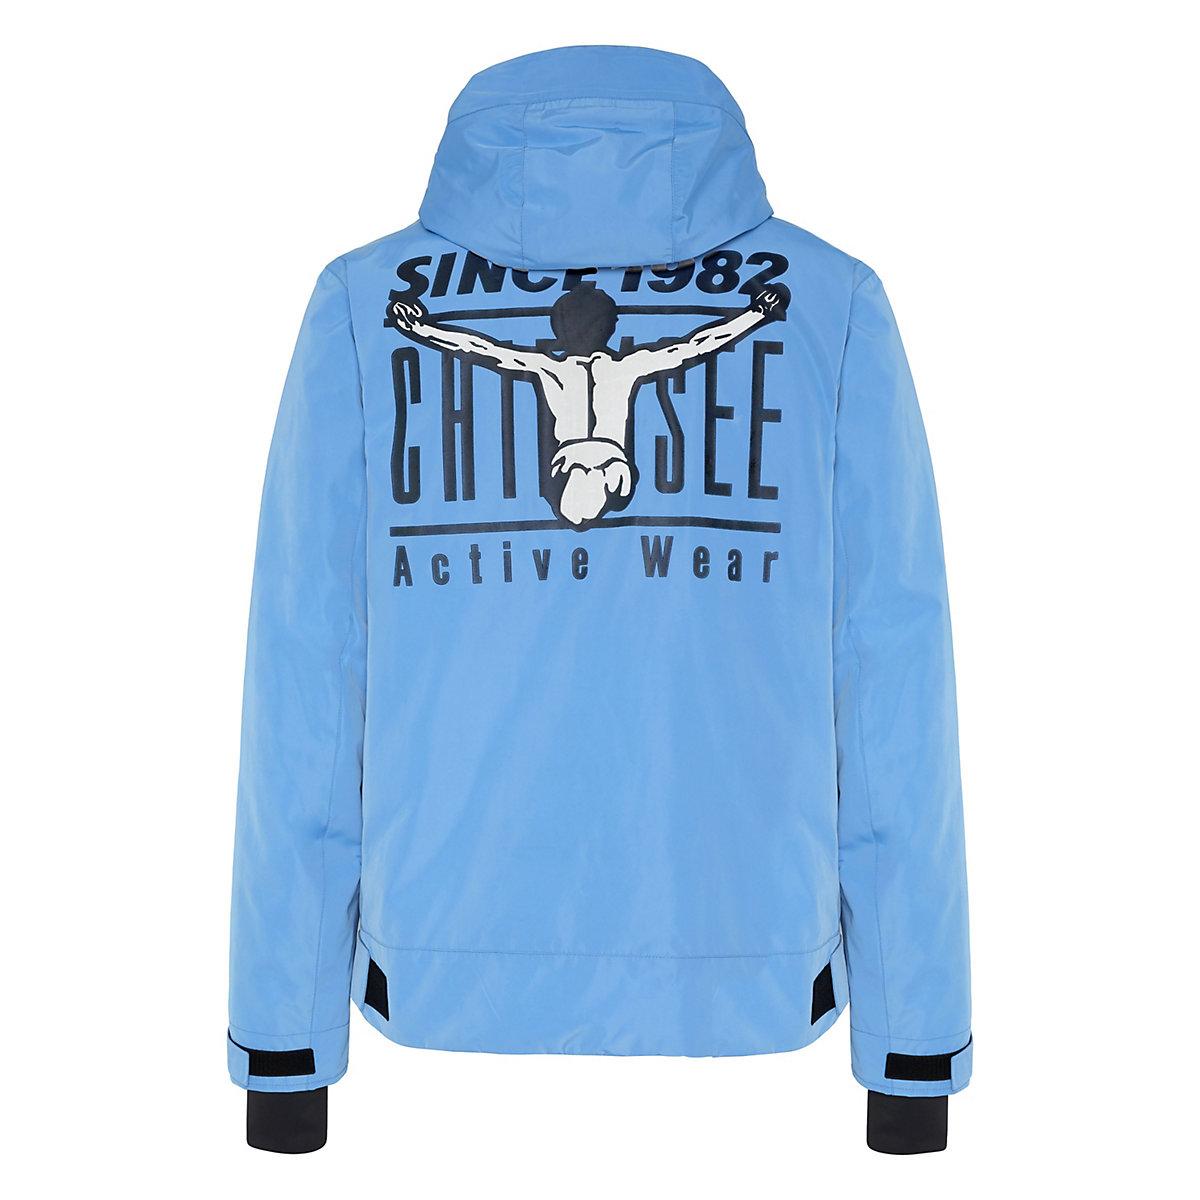 Chiemsee Herren Skijacke Thredbo 22193503 azure blue